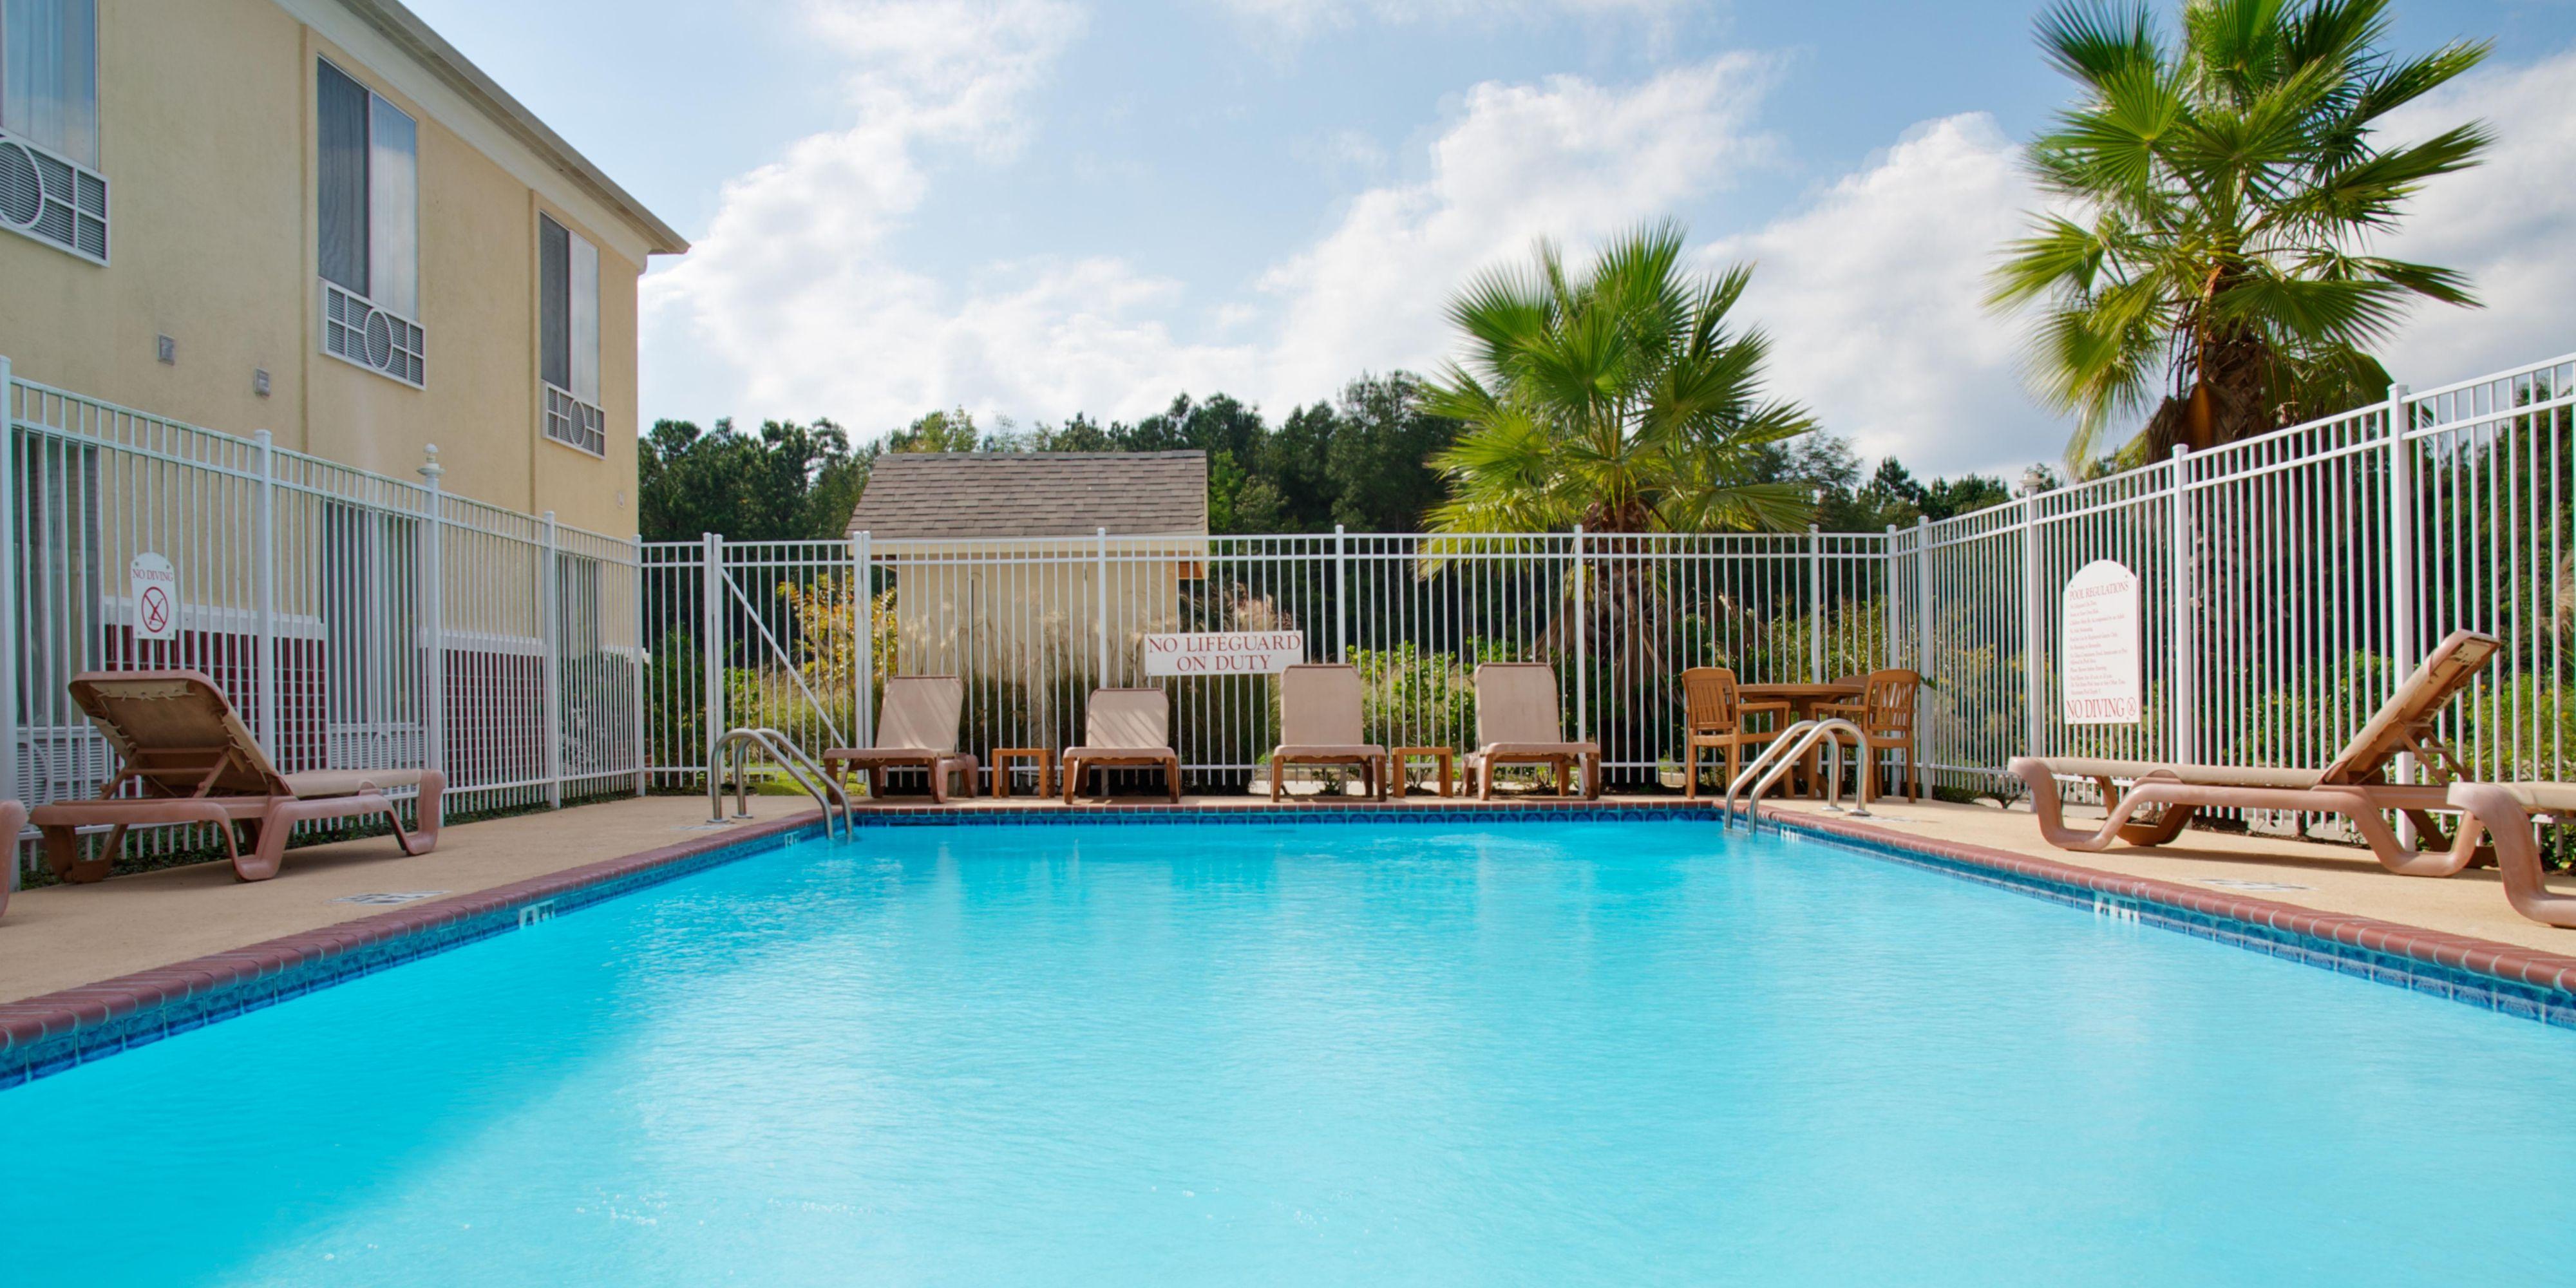 Holiday Inn Express Leesville 4293512347 2x1